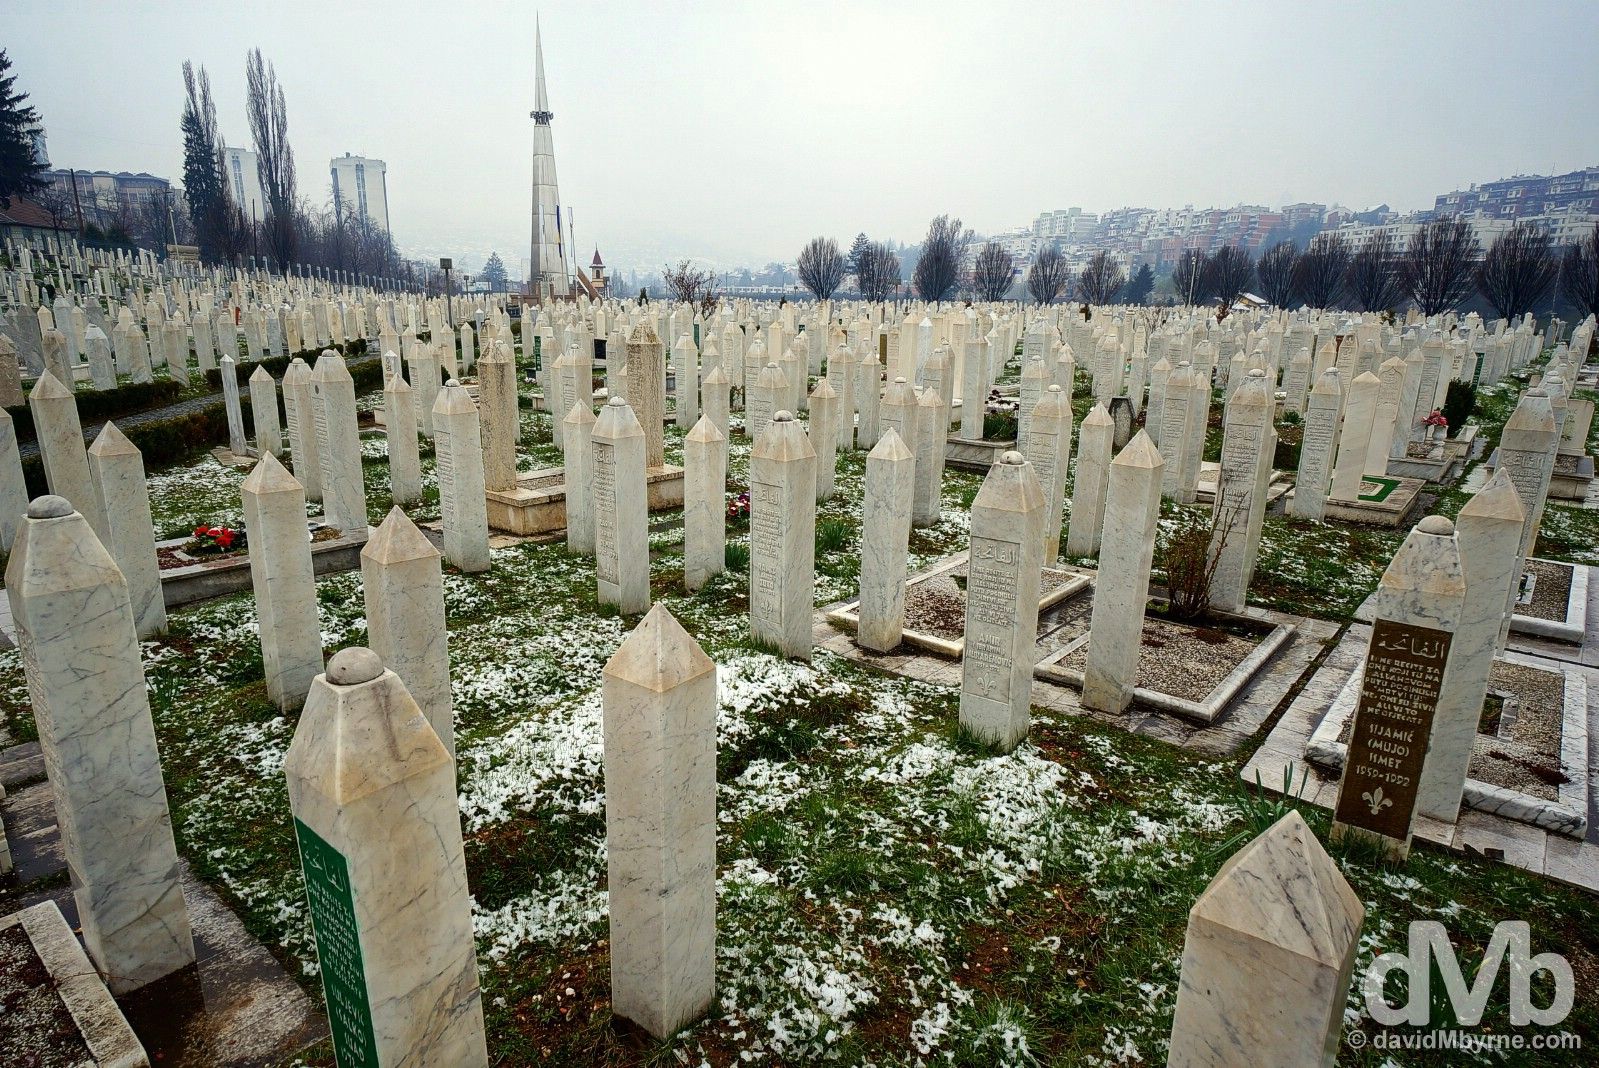 Gradsko groblje Bare cemetery, Sarajevo, Bosnia and Herzegovina. April 5, 2015.